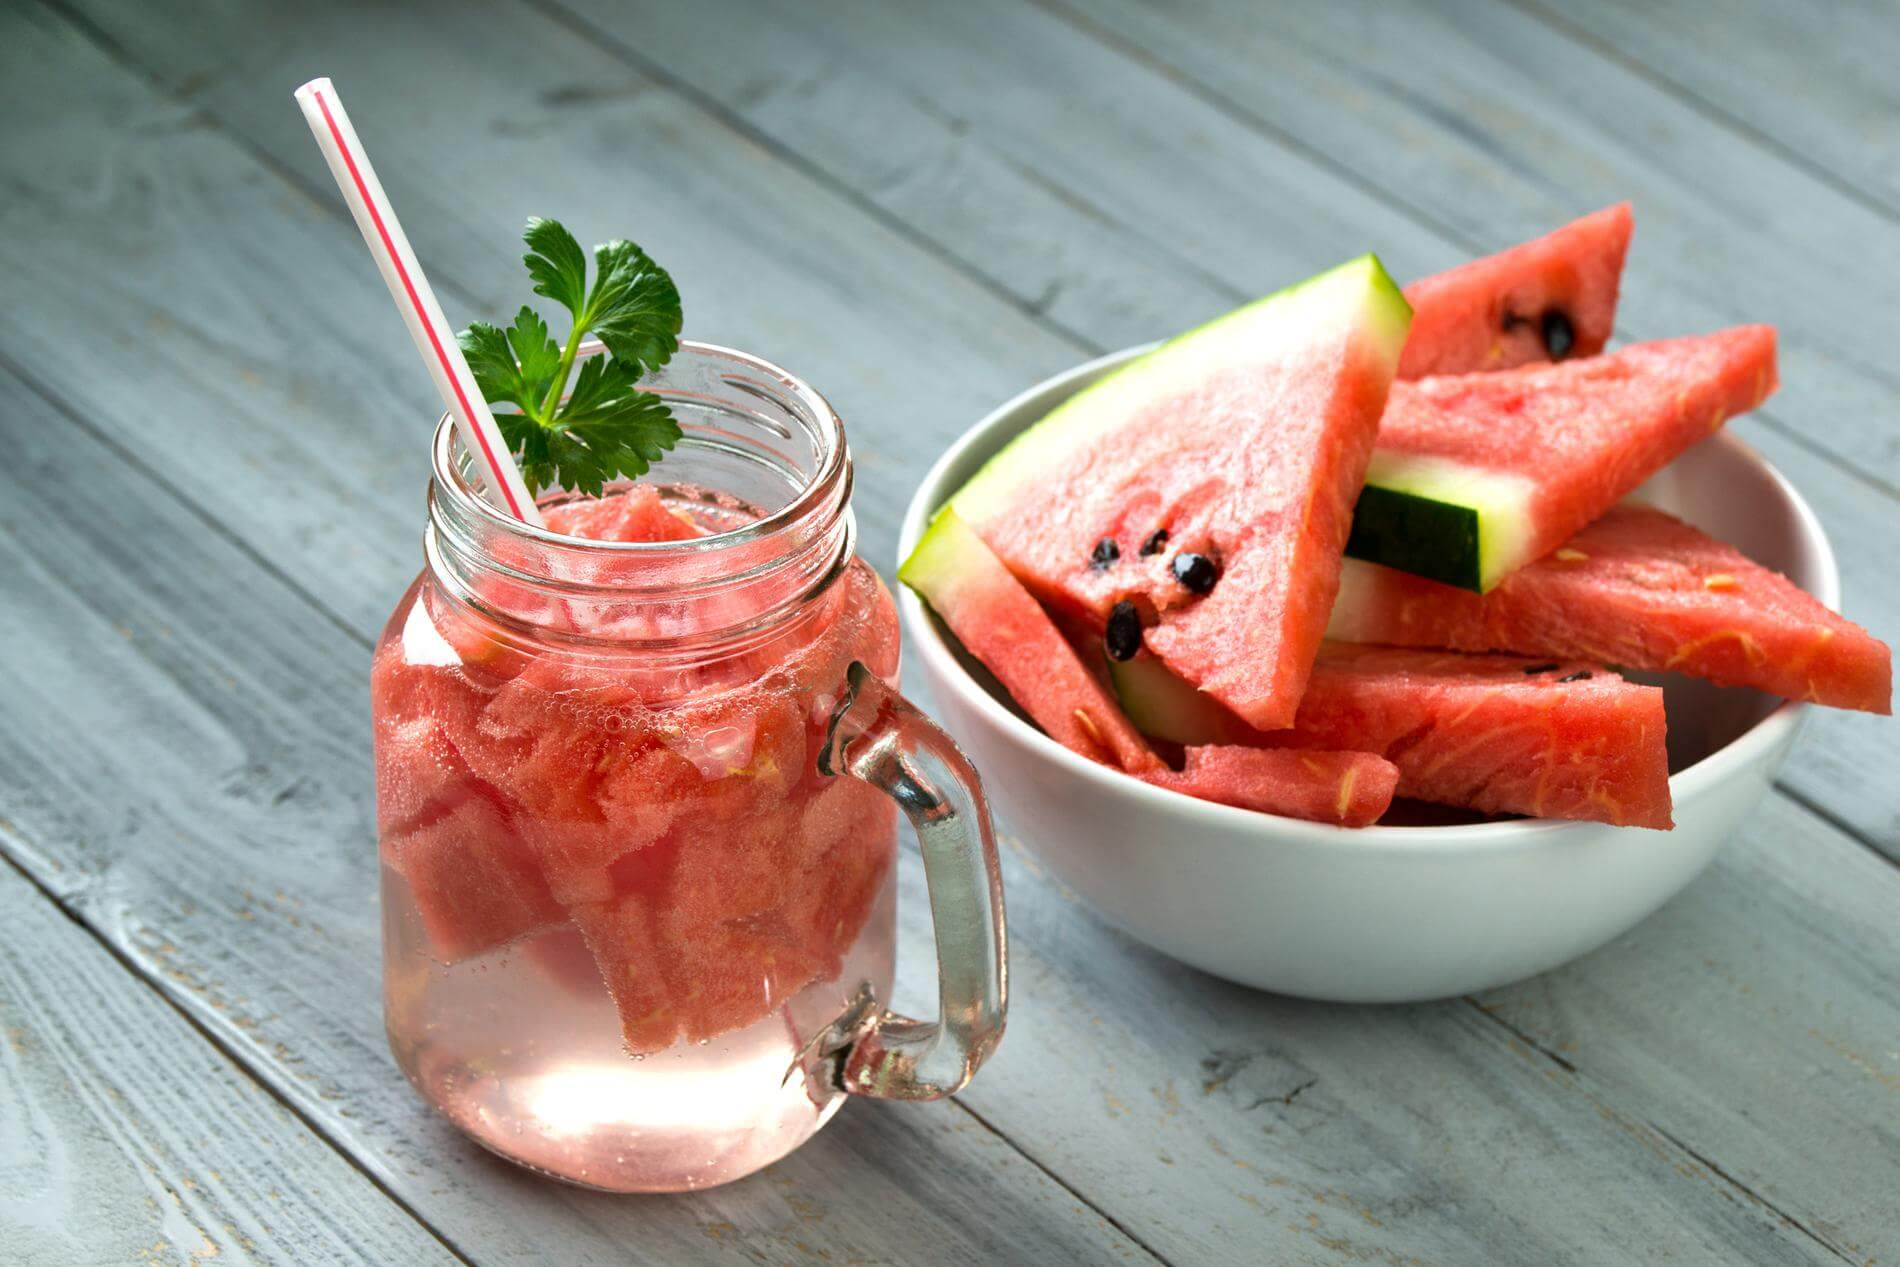 Watermelon detox water recipe